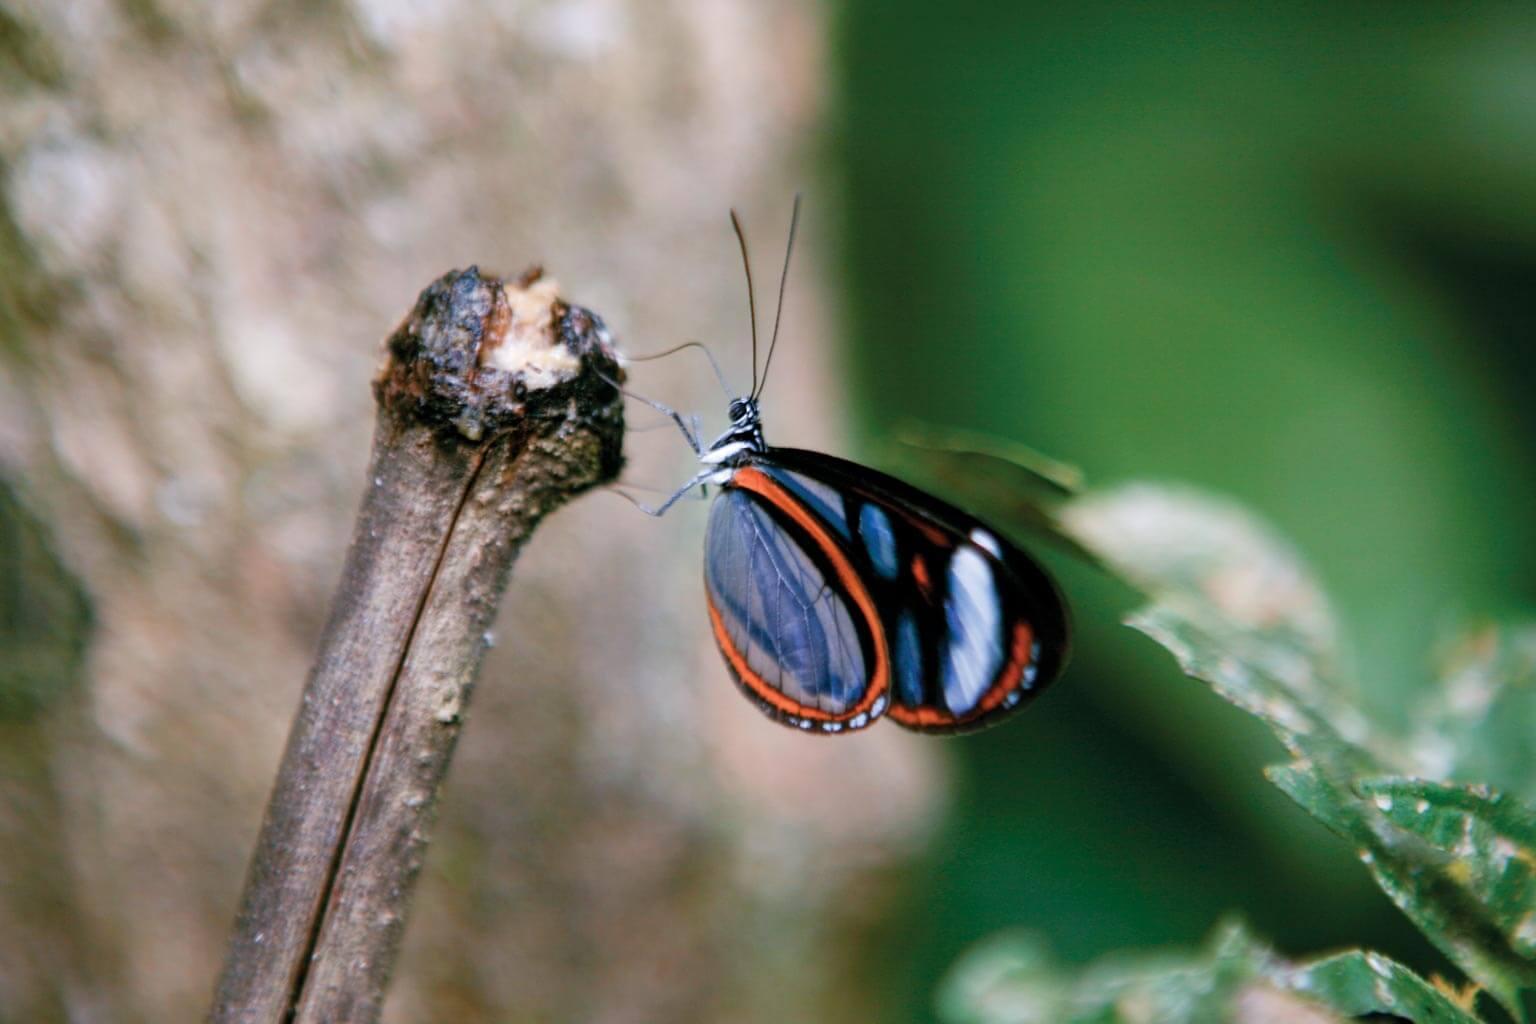 Resultado de imagen para inkaterra butterfly house